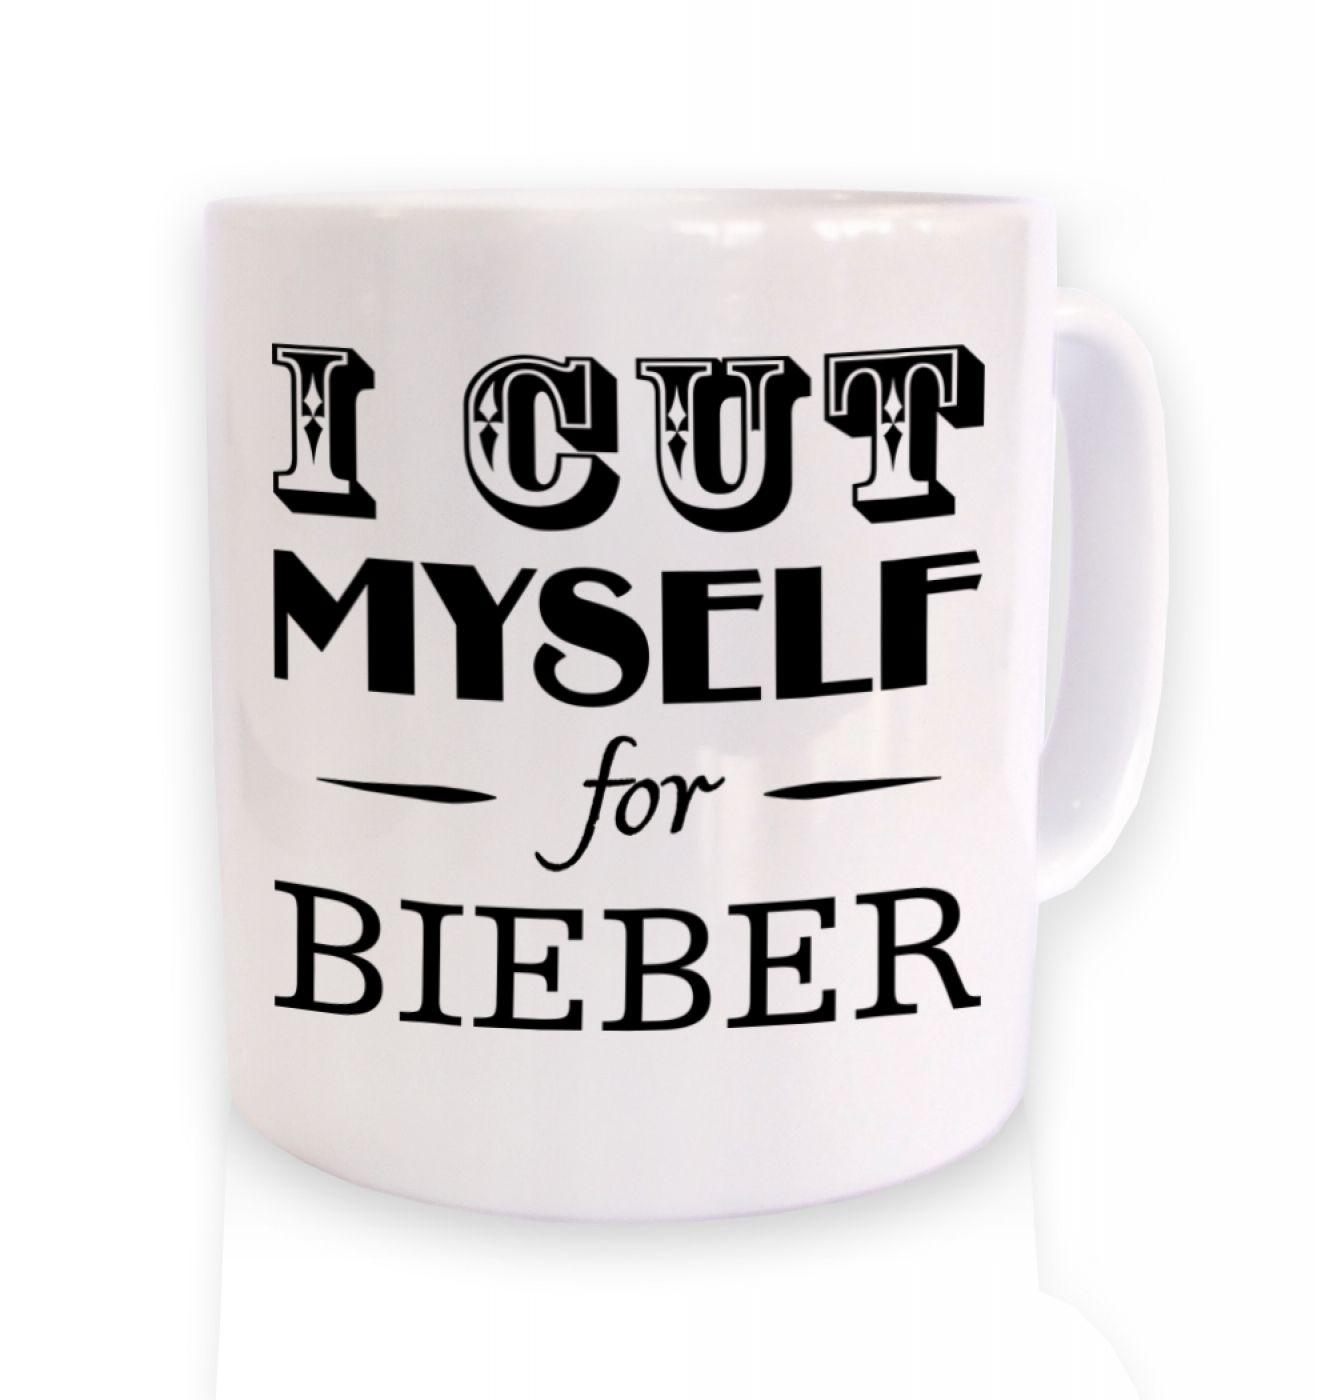 I cut myself for bieber slogan mug